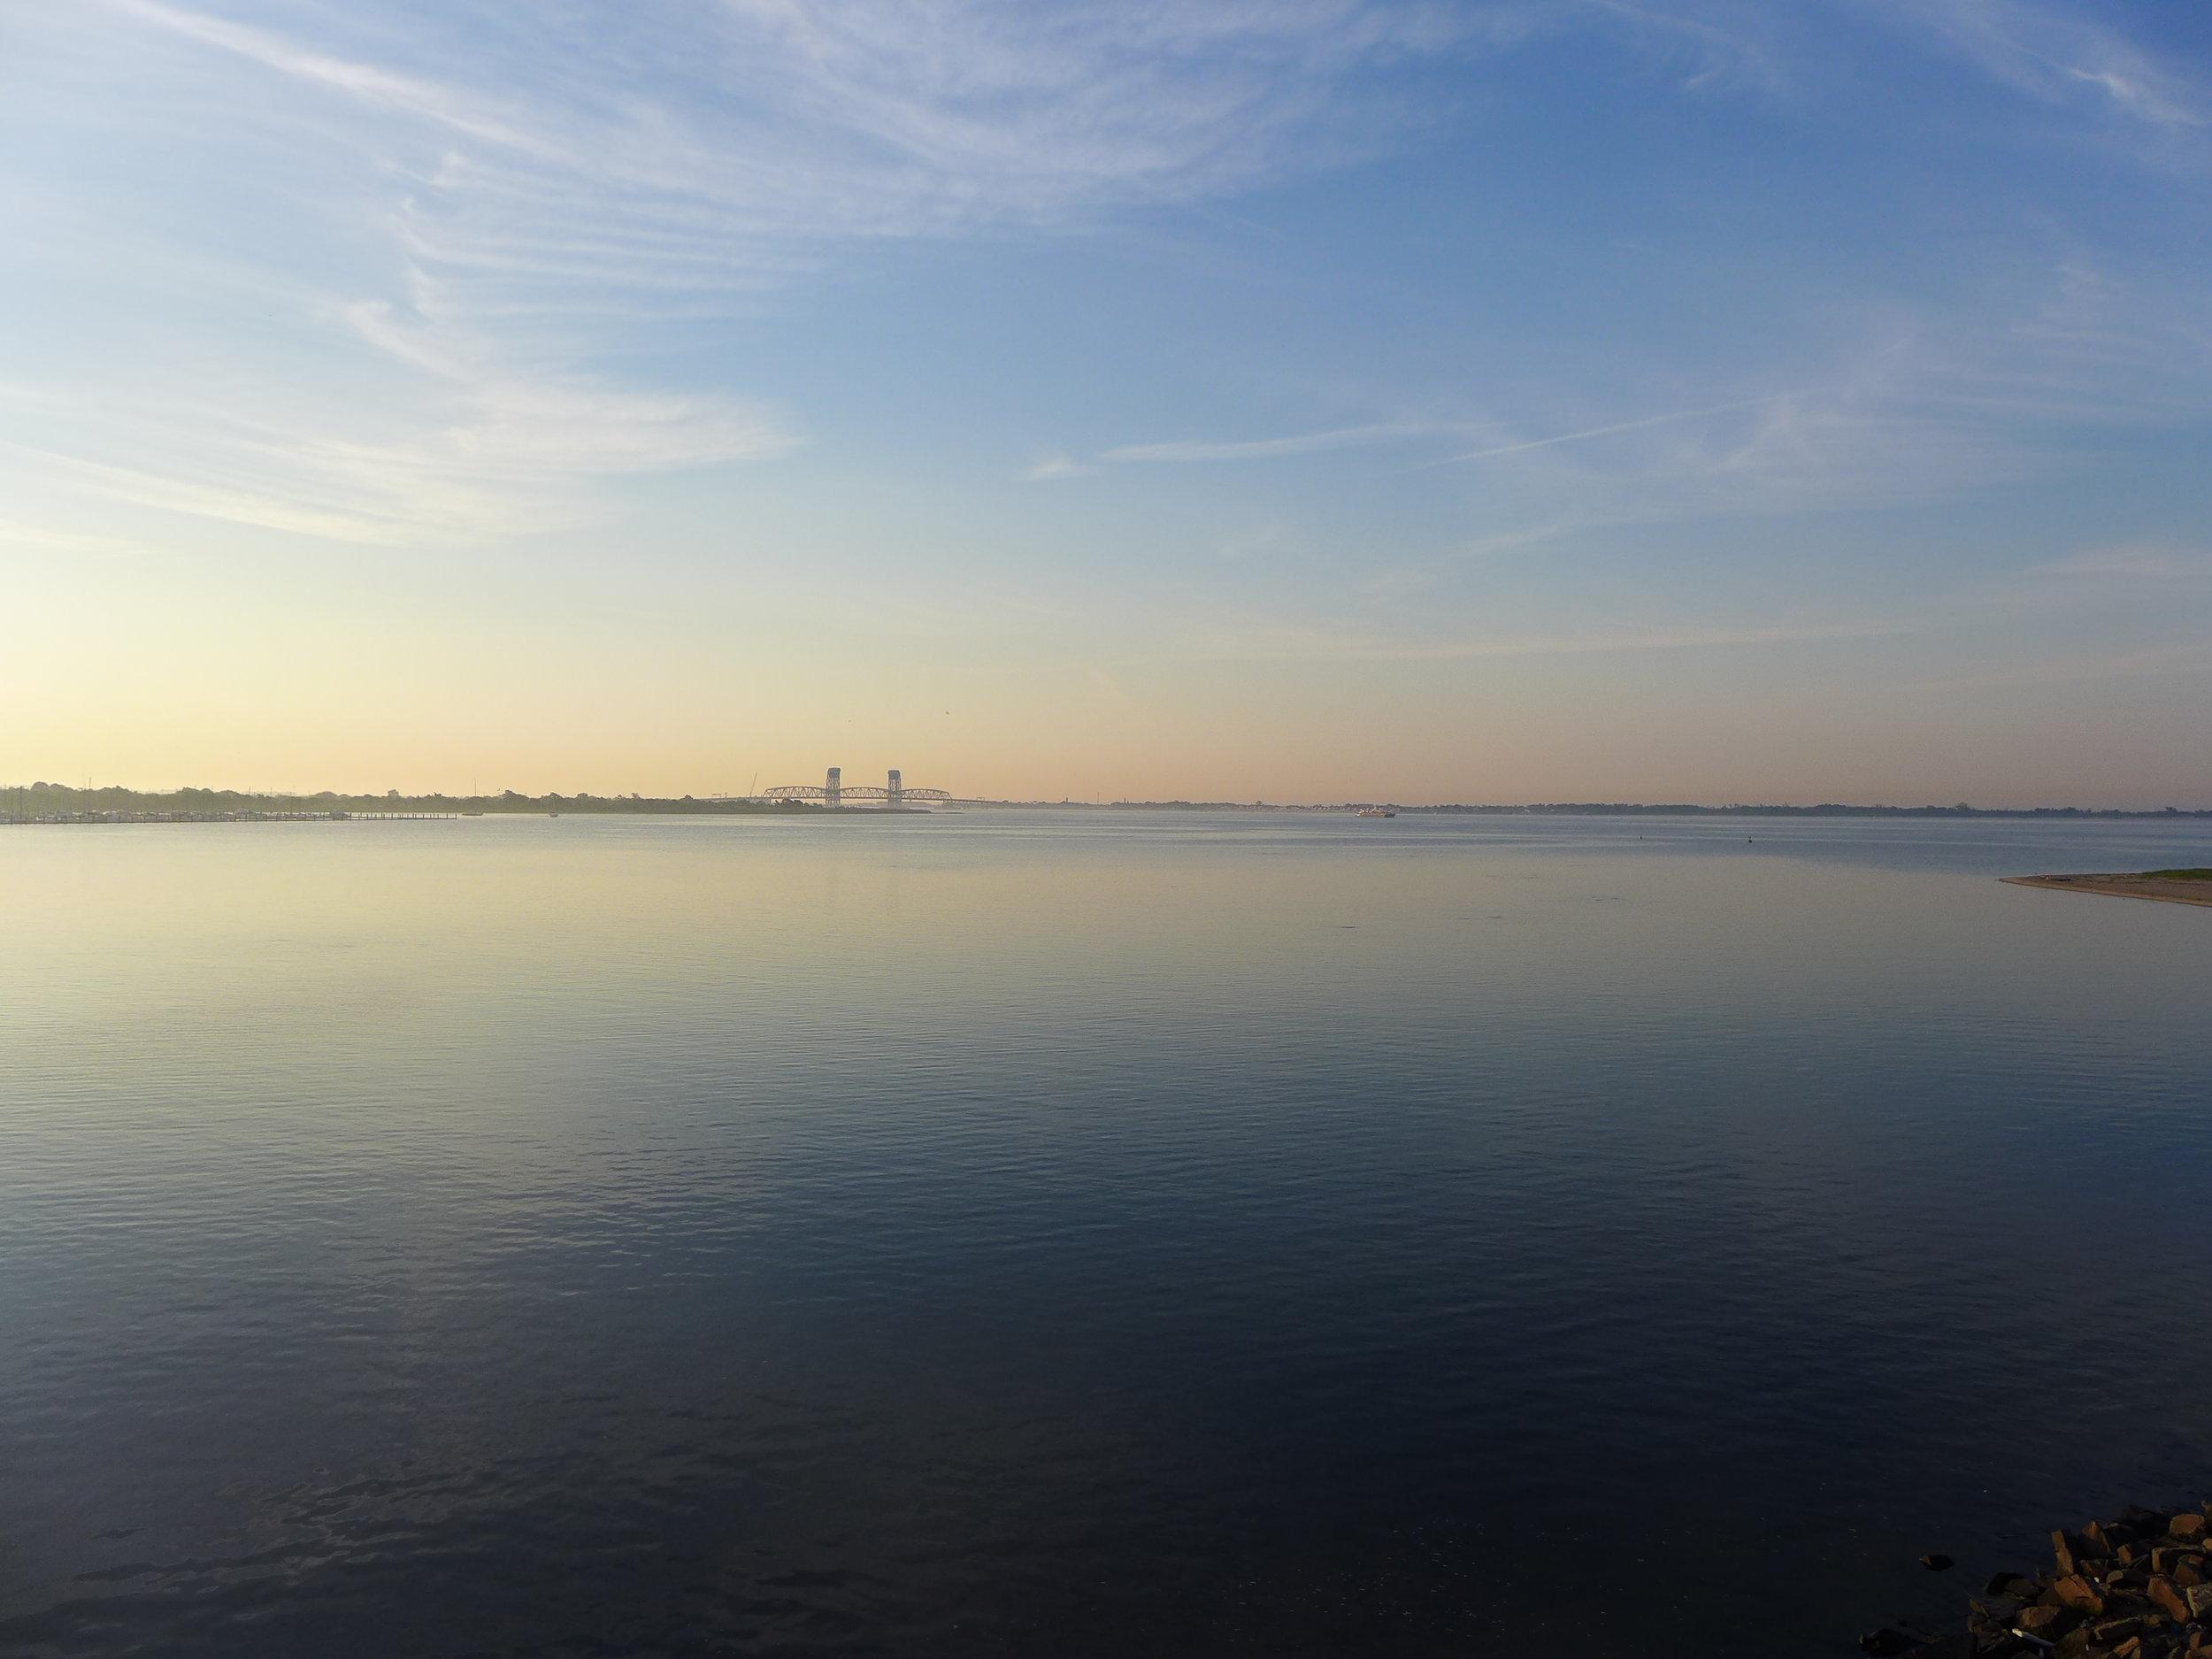 View of Marine Parkway Bridge